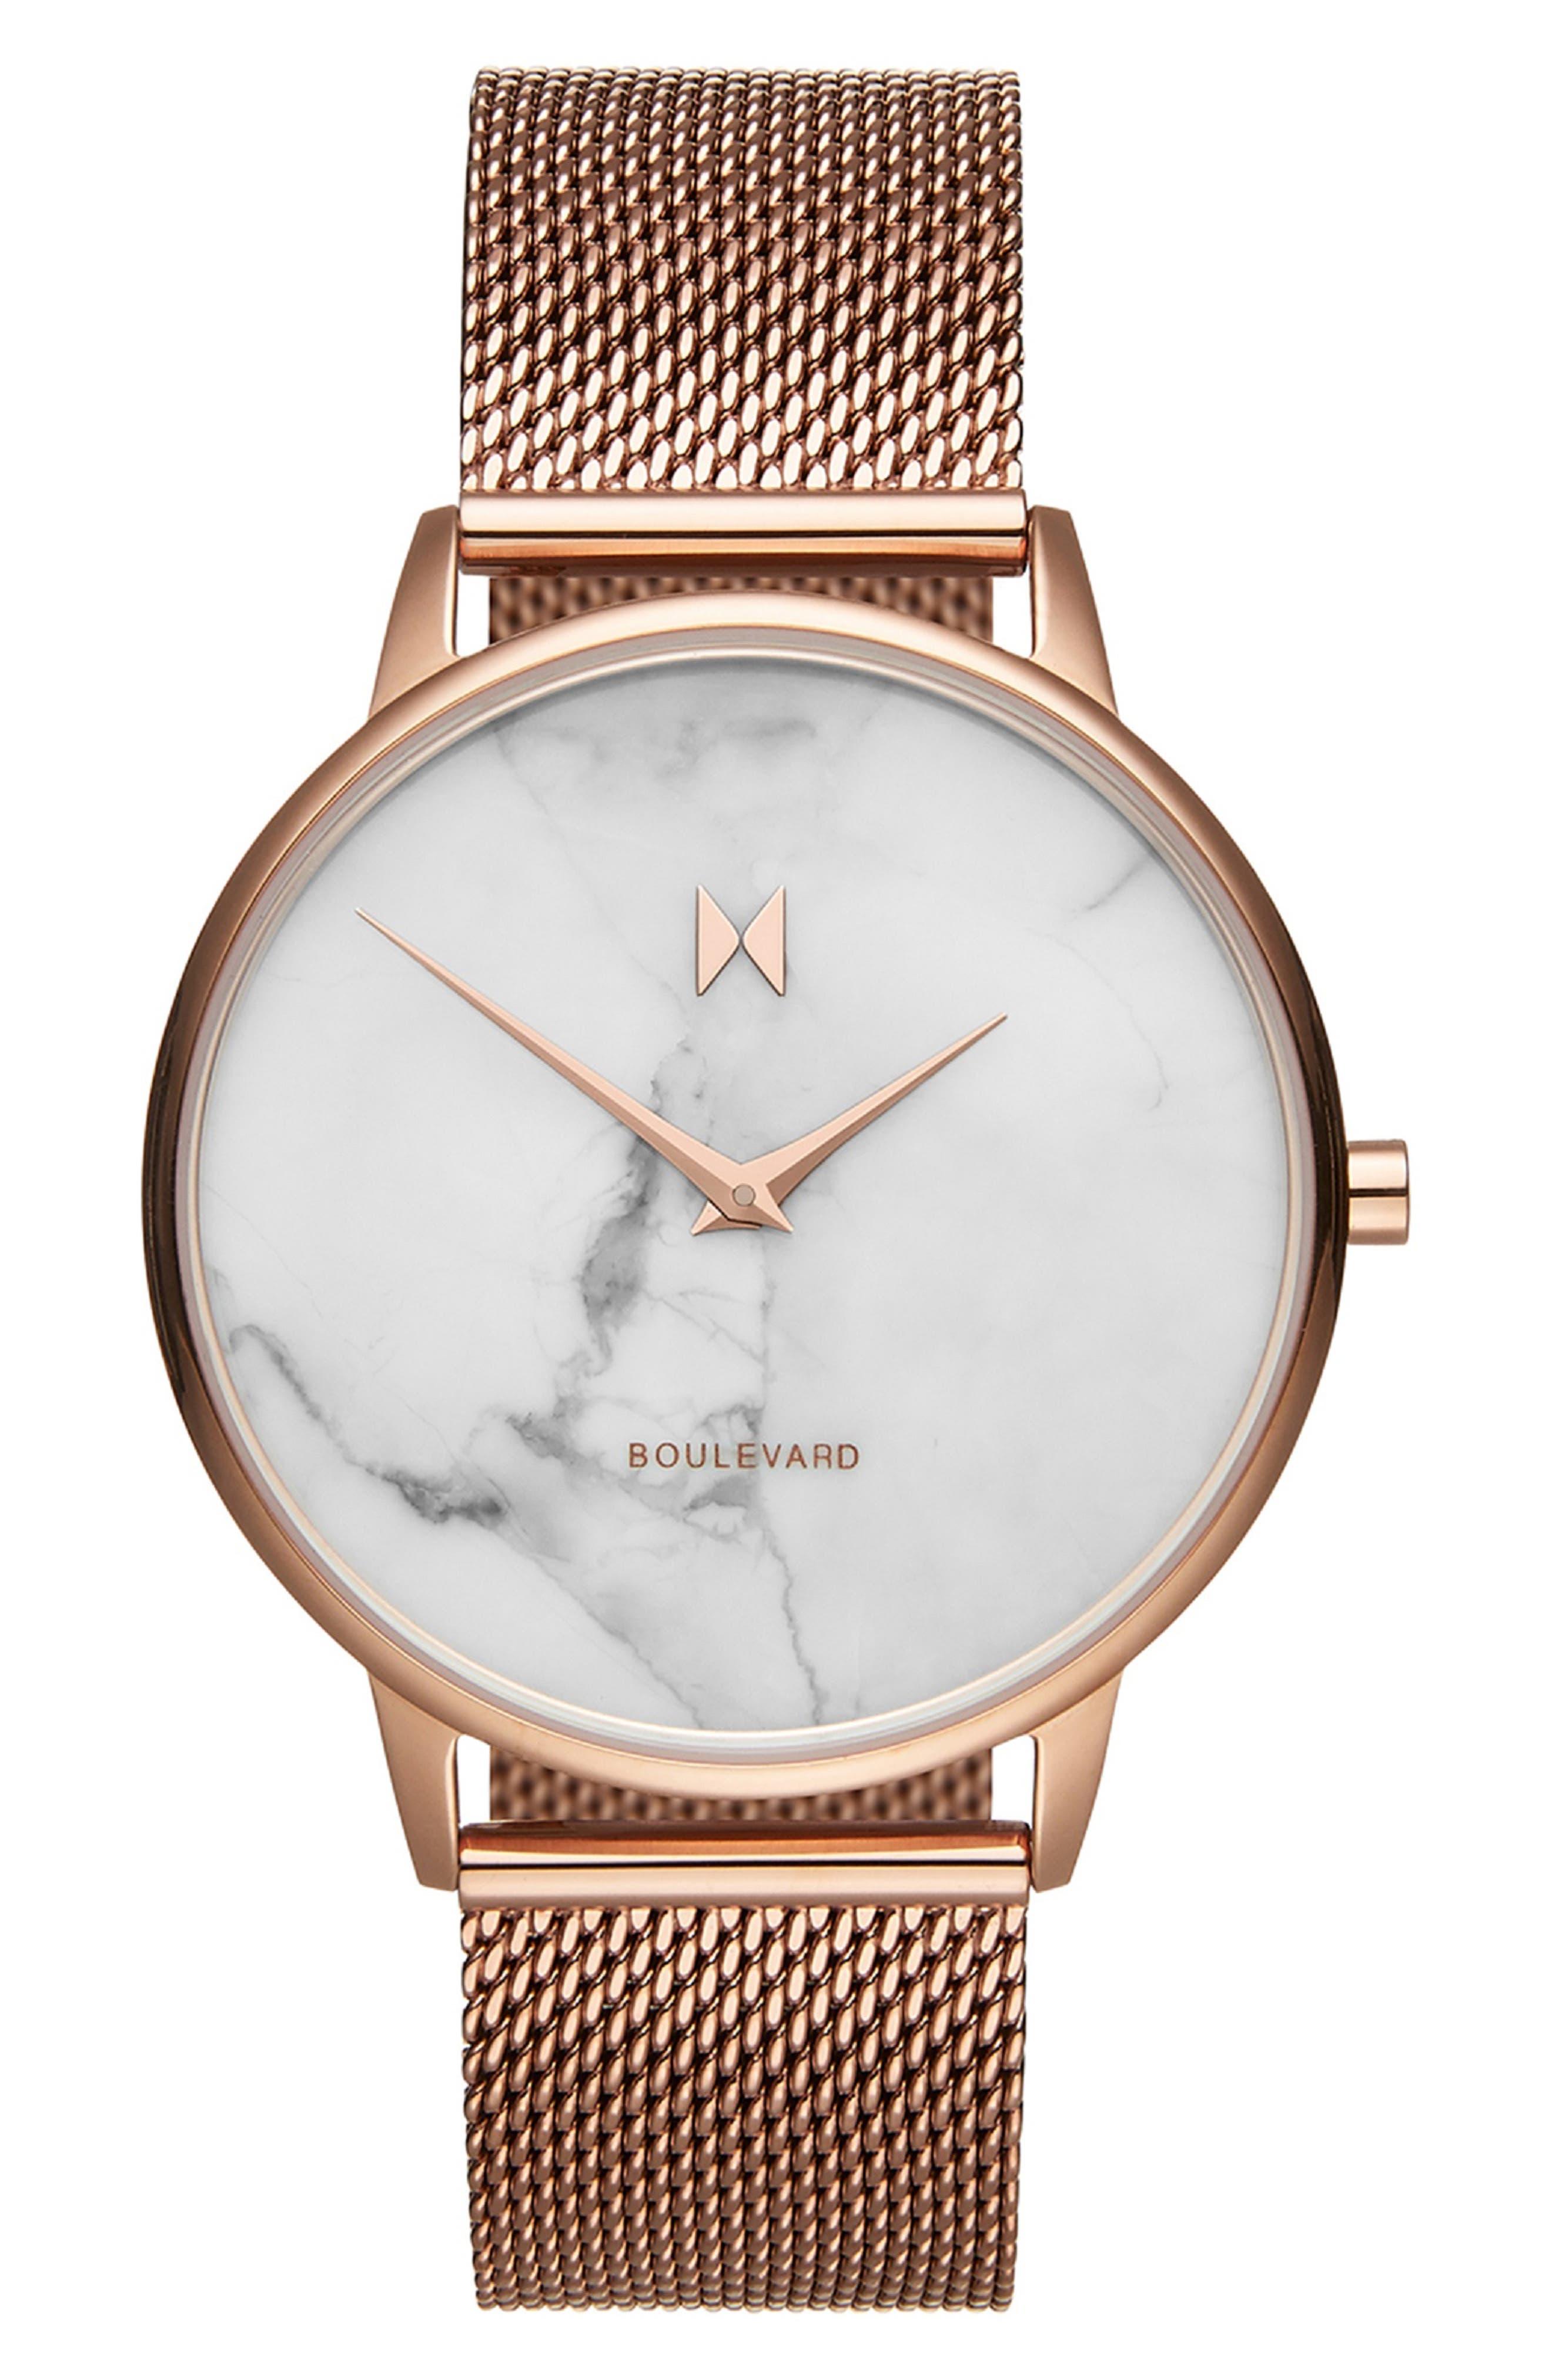 Boulevard Mesh Strap Watch, 38mm,                             Main thumbnail 1, color,                             ROSE GOLD/ WHITE/ ROSE GOLD